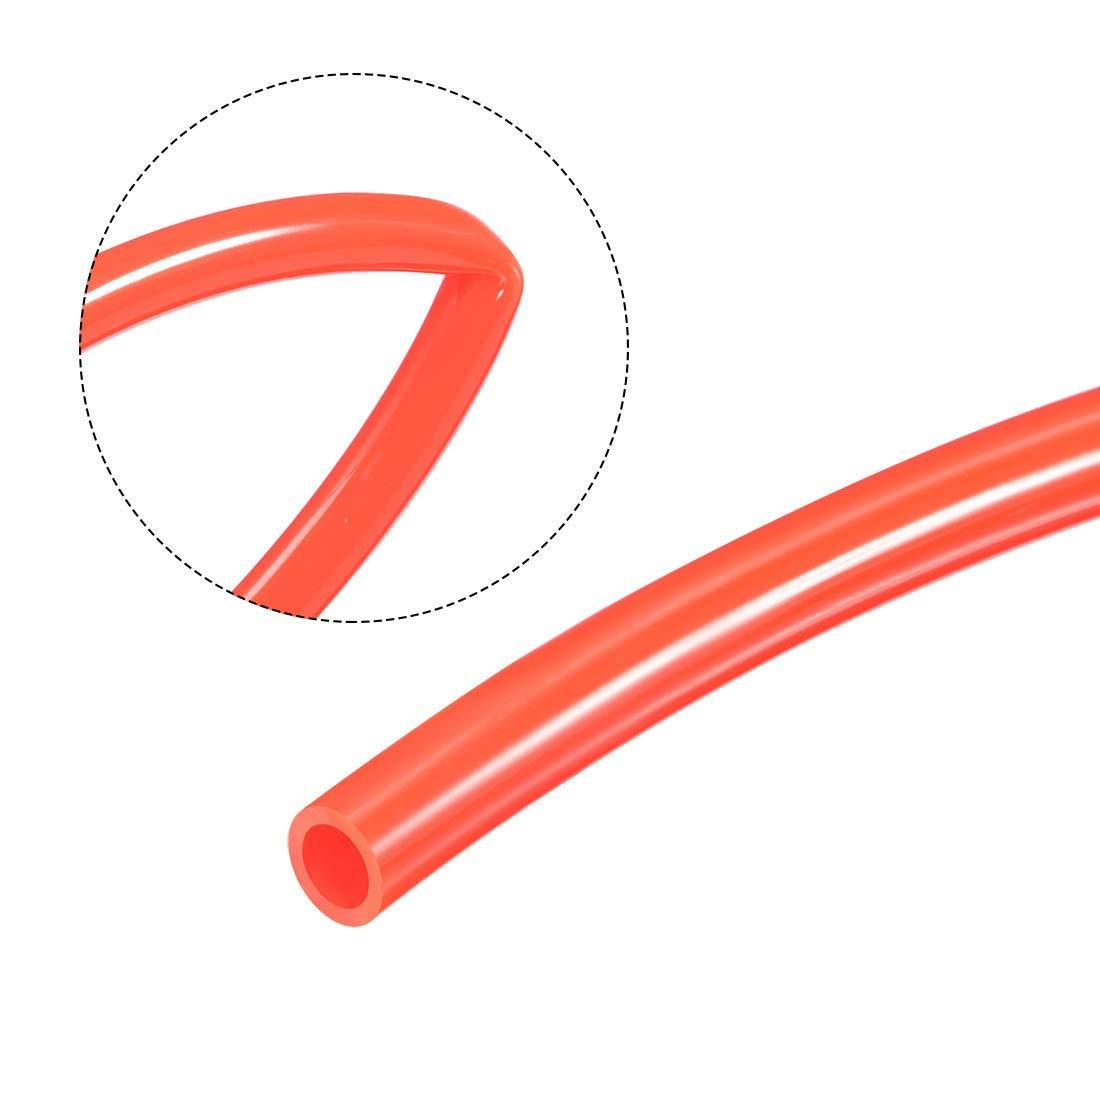 13 ft outer diameter 3//8 inch polyurethane air compressor tube hose tube 4 m pneumatic air tube black